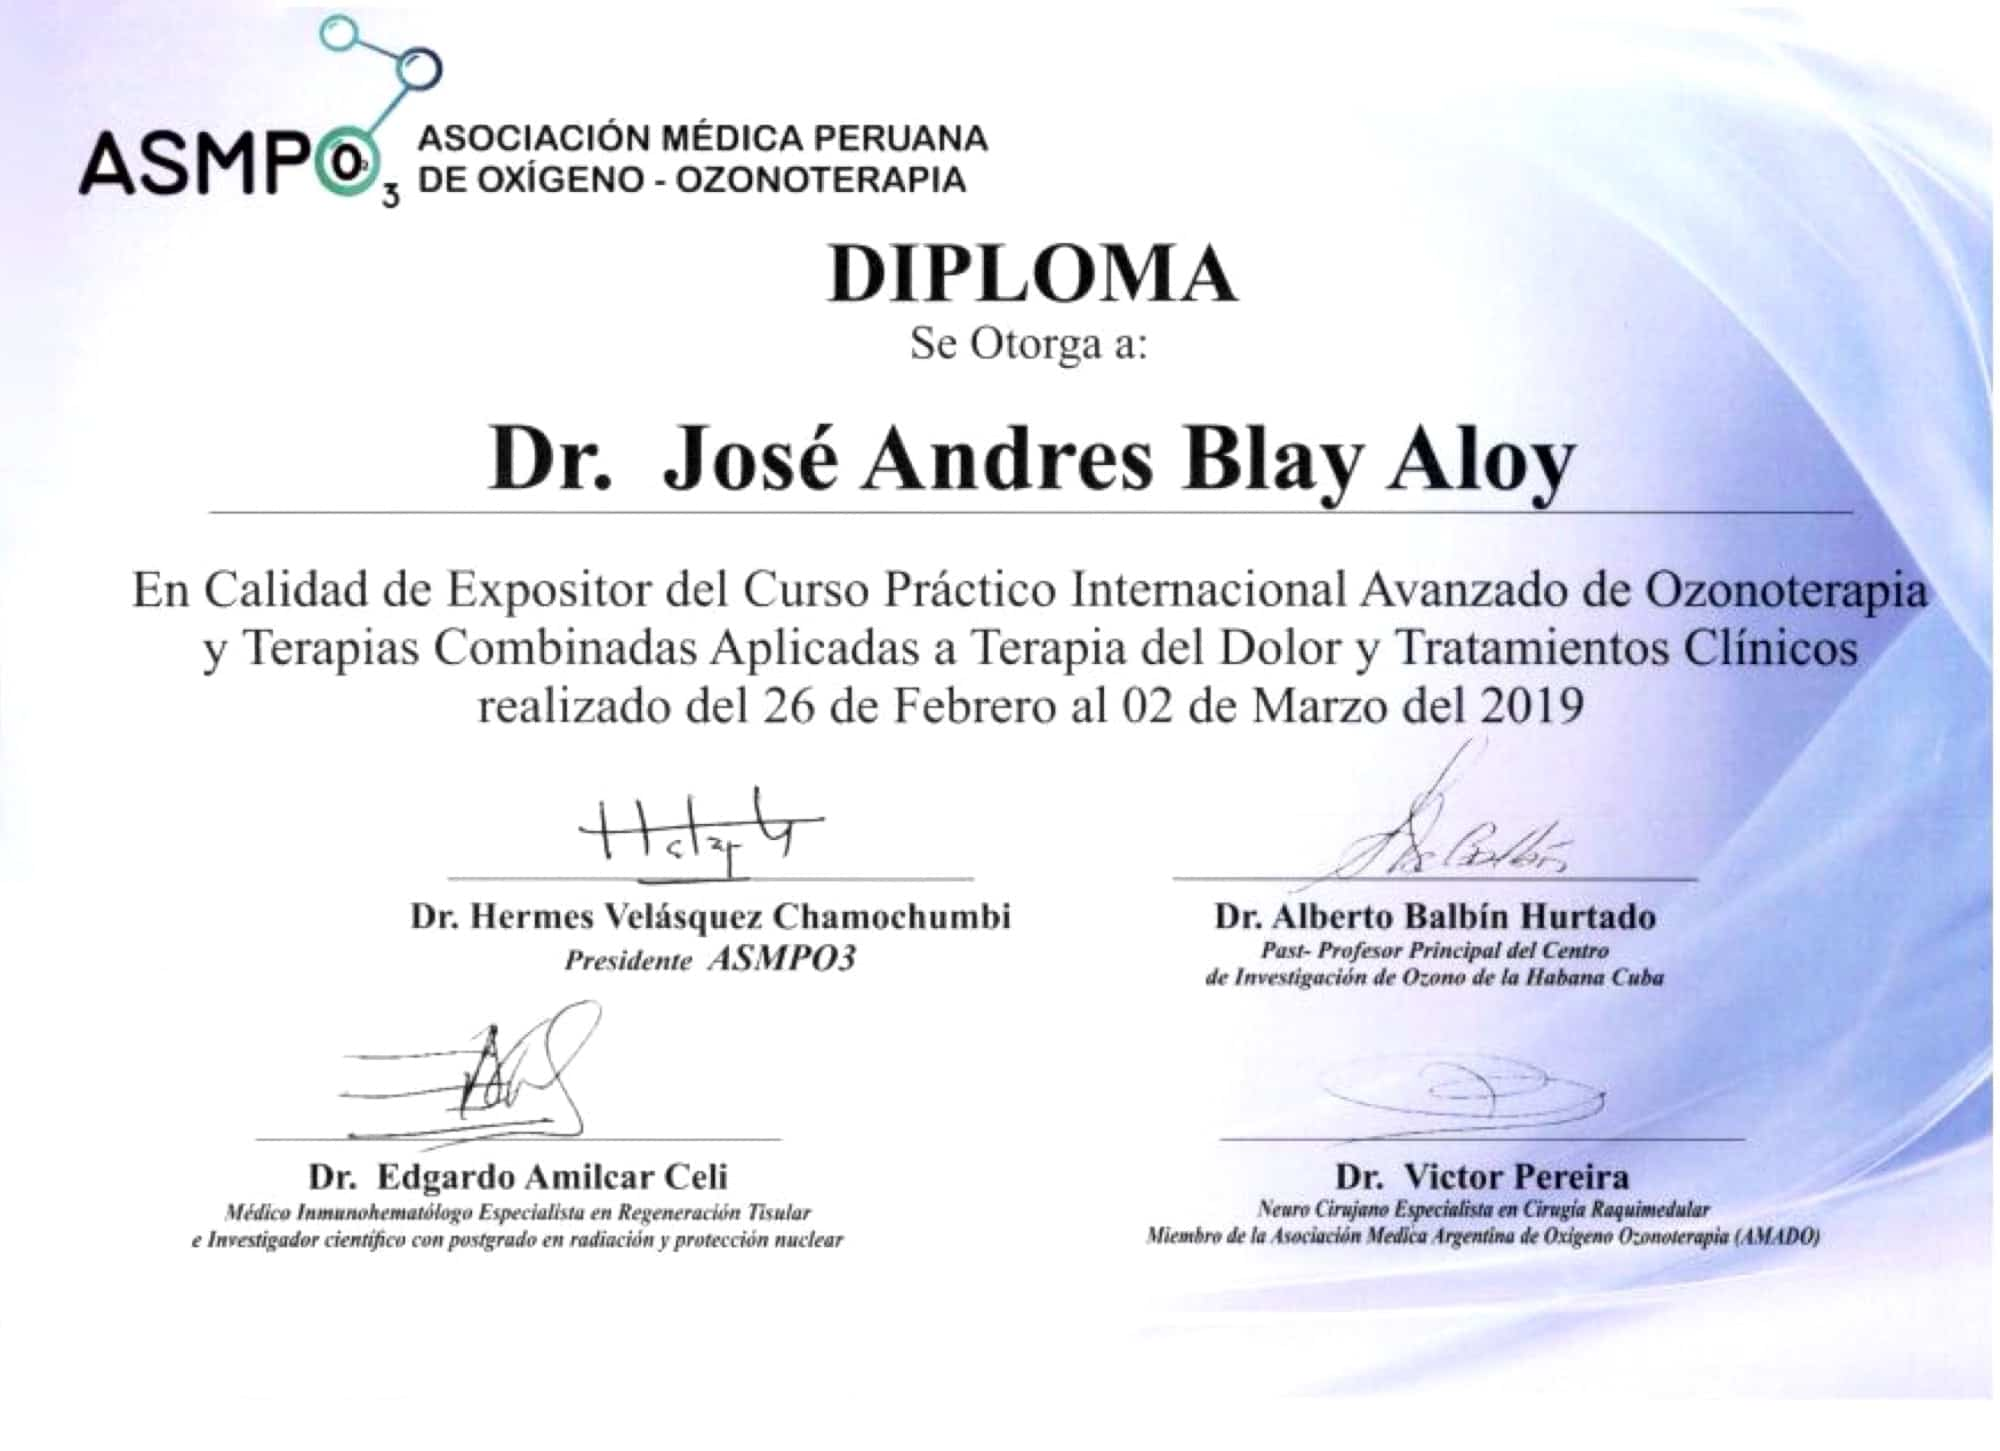 Diploma ASMPO Jose Andres Blay Aloy